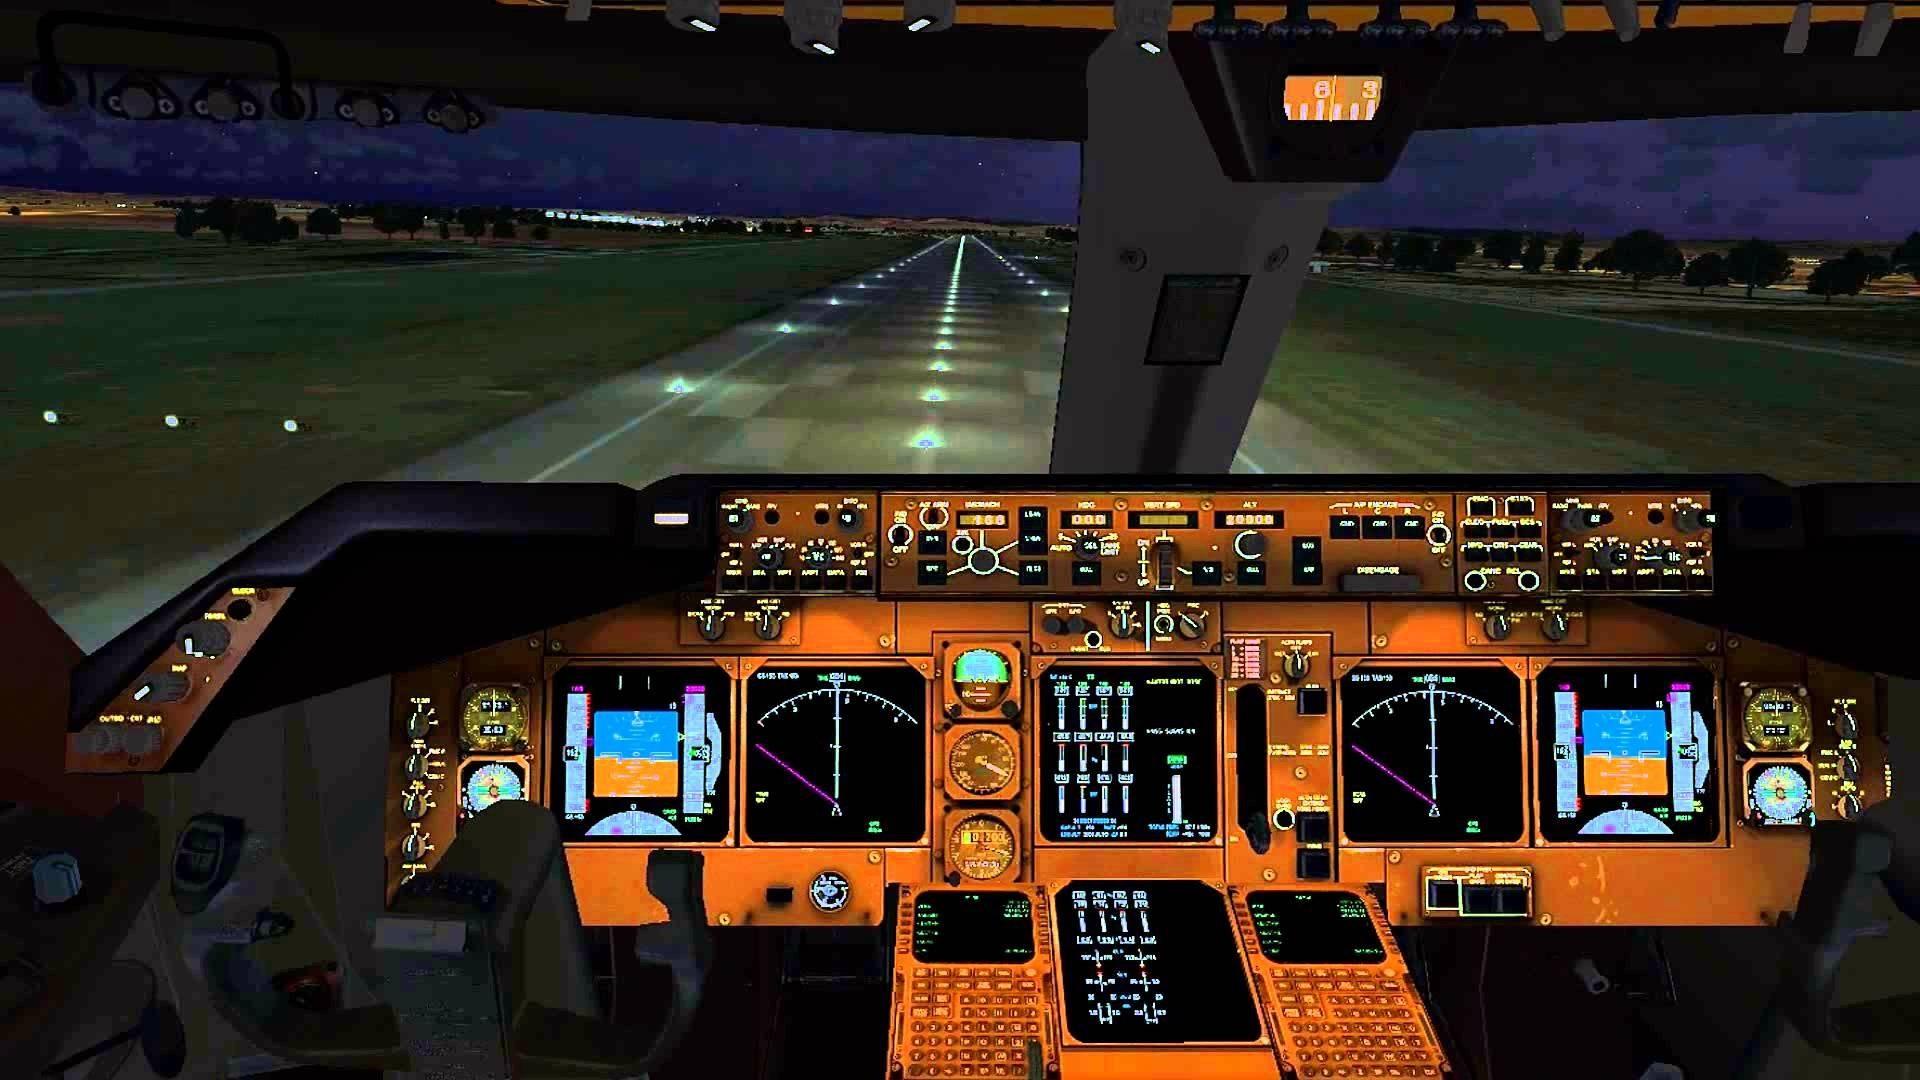 Boeing 747 Cockpit Wallpaper Desktop Wallppapers Gallery